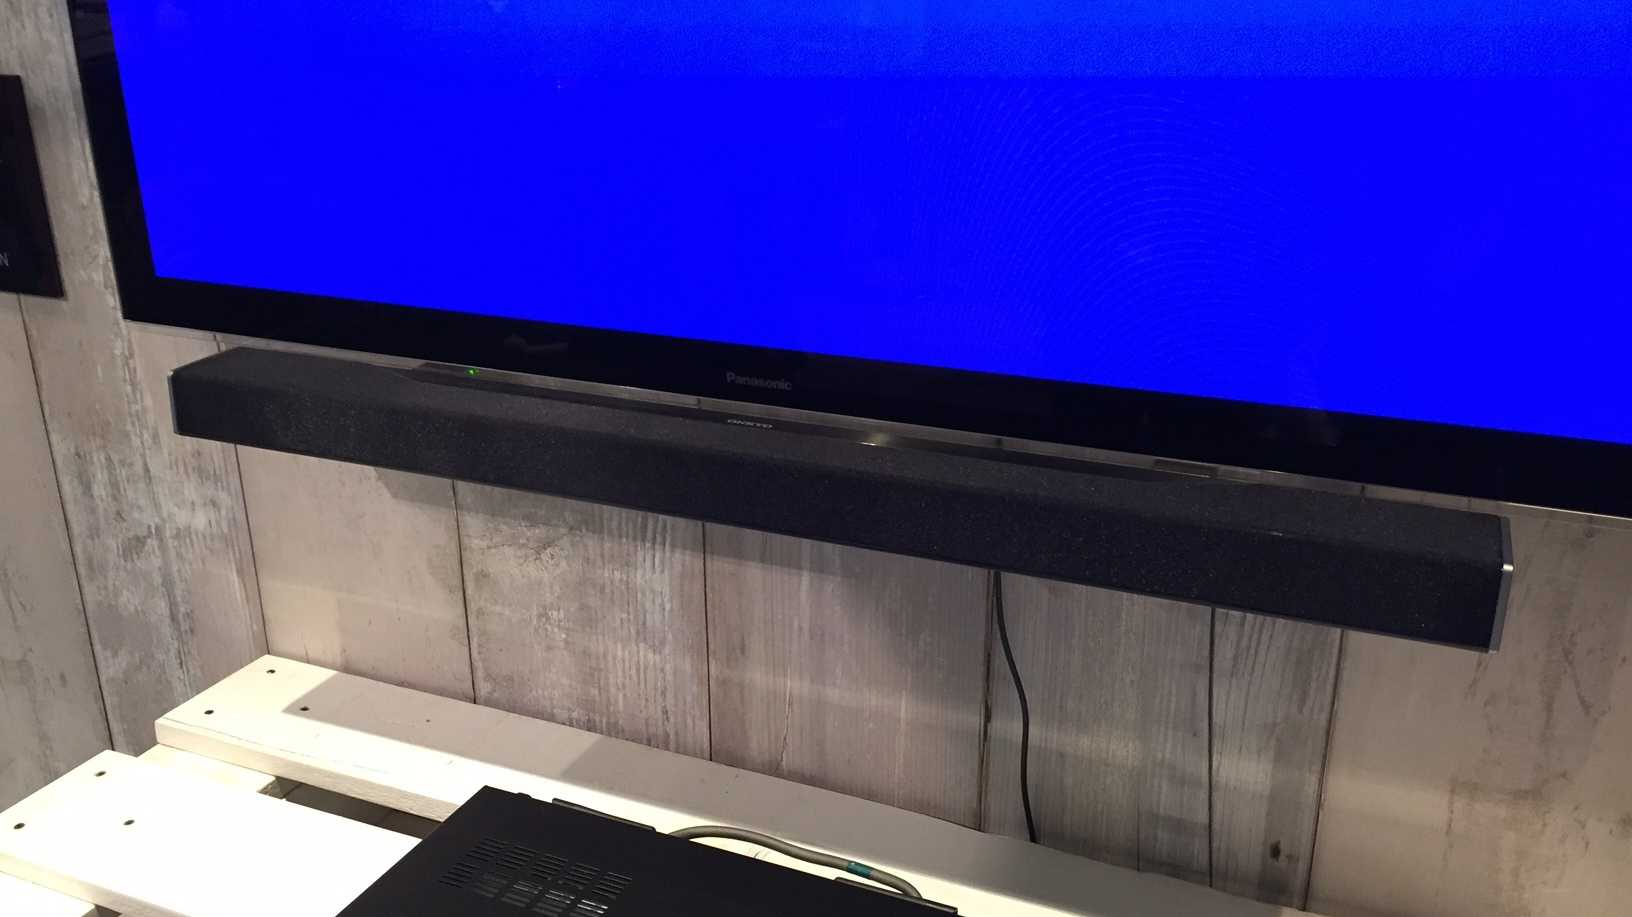 3D-Sound: Onkyo zeigt Atmos-Soundbar mit 3.1.2 Kanälen